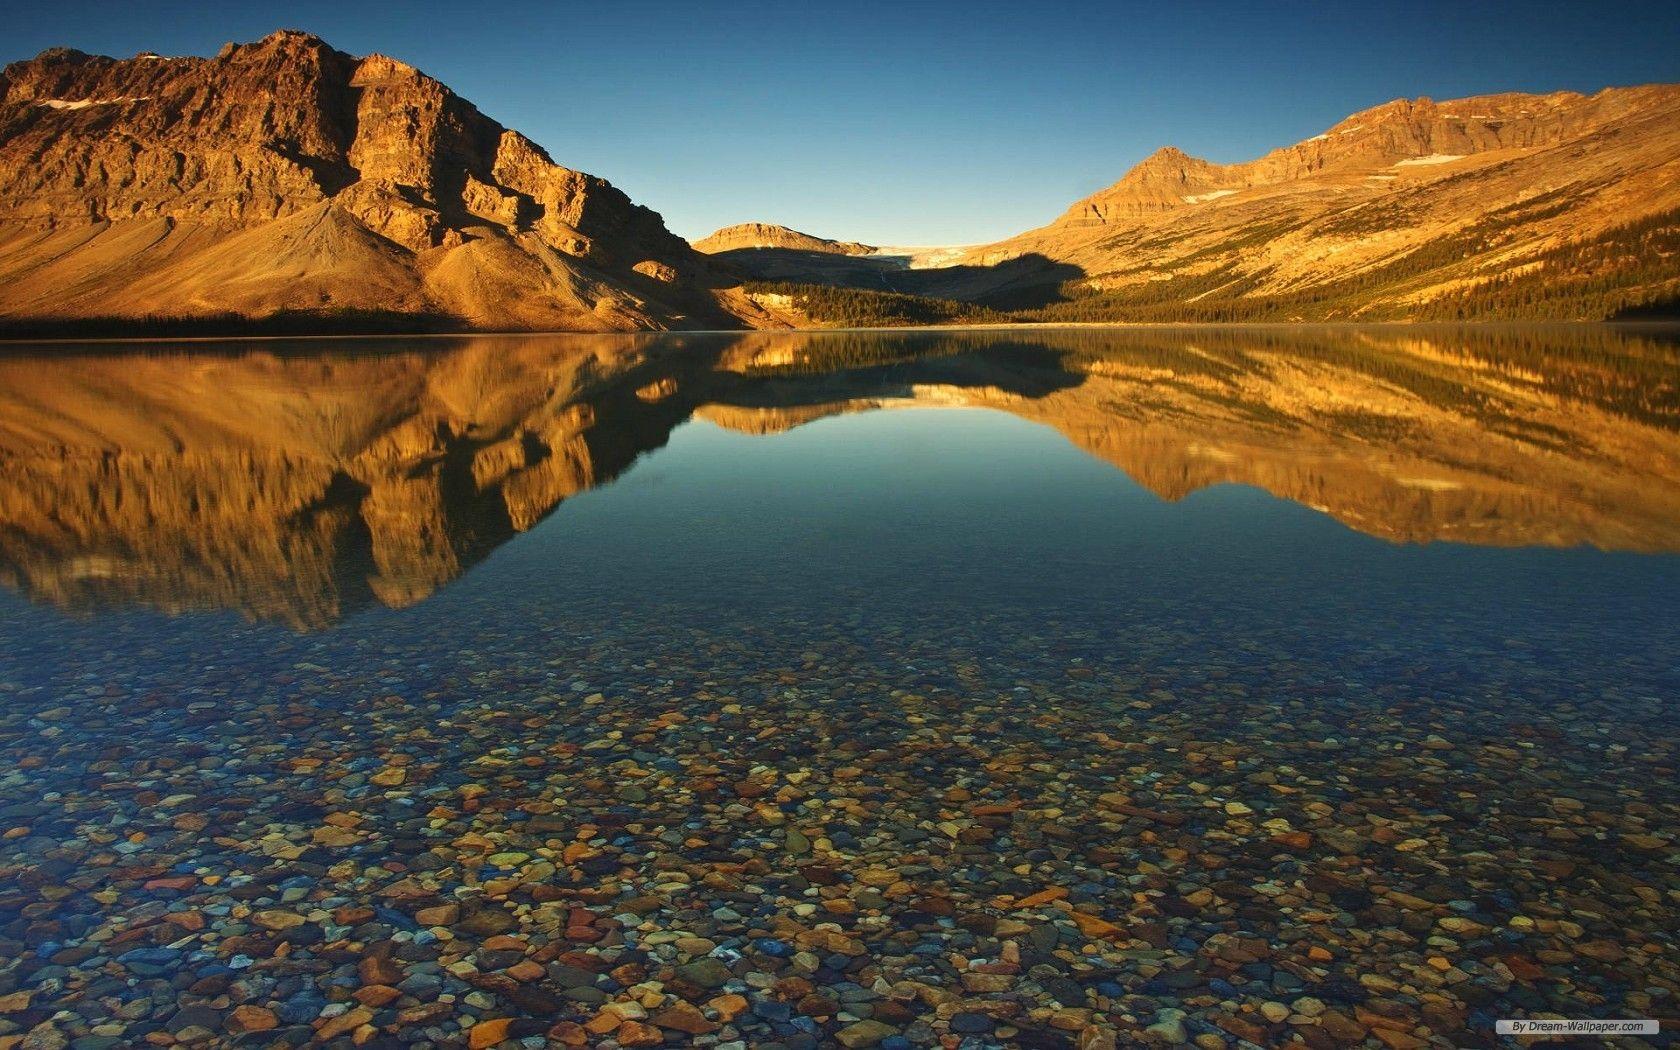 Free Nature Wallpaper Hd Landscape 5 Wallpaper 1680x1050 Wallpaper Index 6 Mountain Lakes Hd Landscape Lake Photos